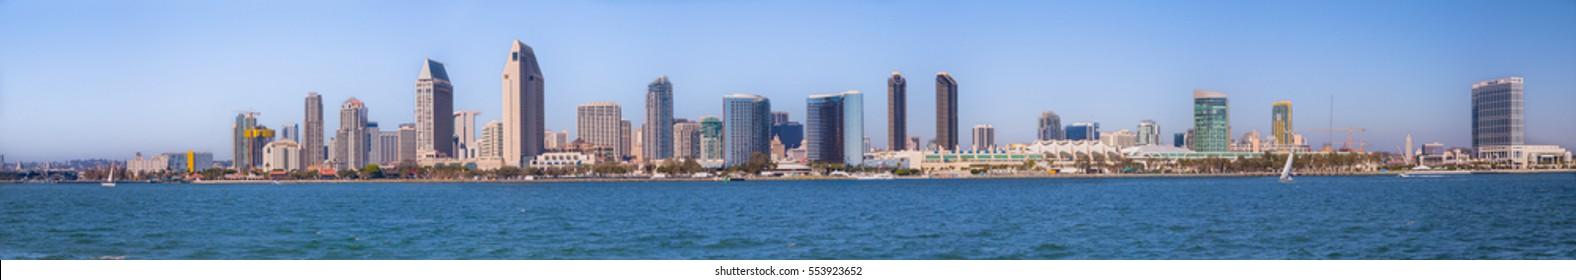 Downtown San Diego Skyline In Day Time